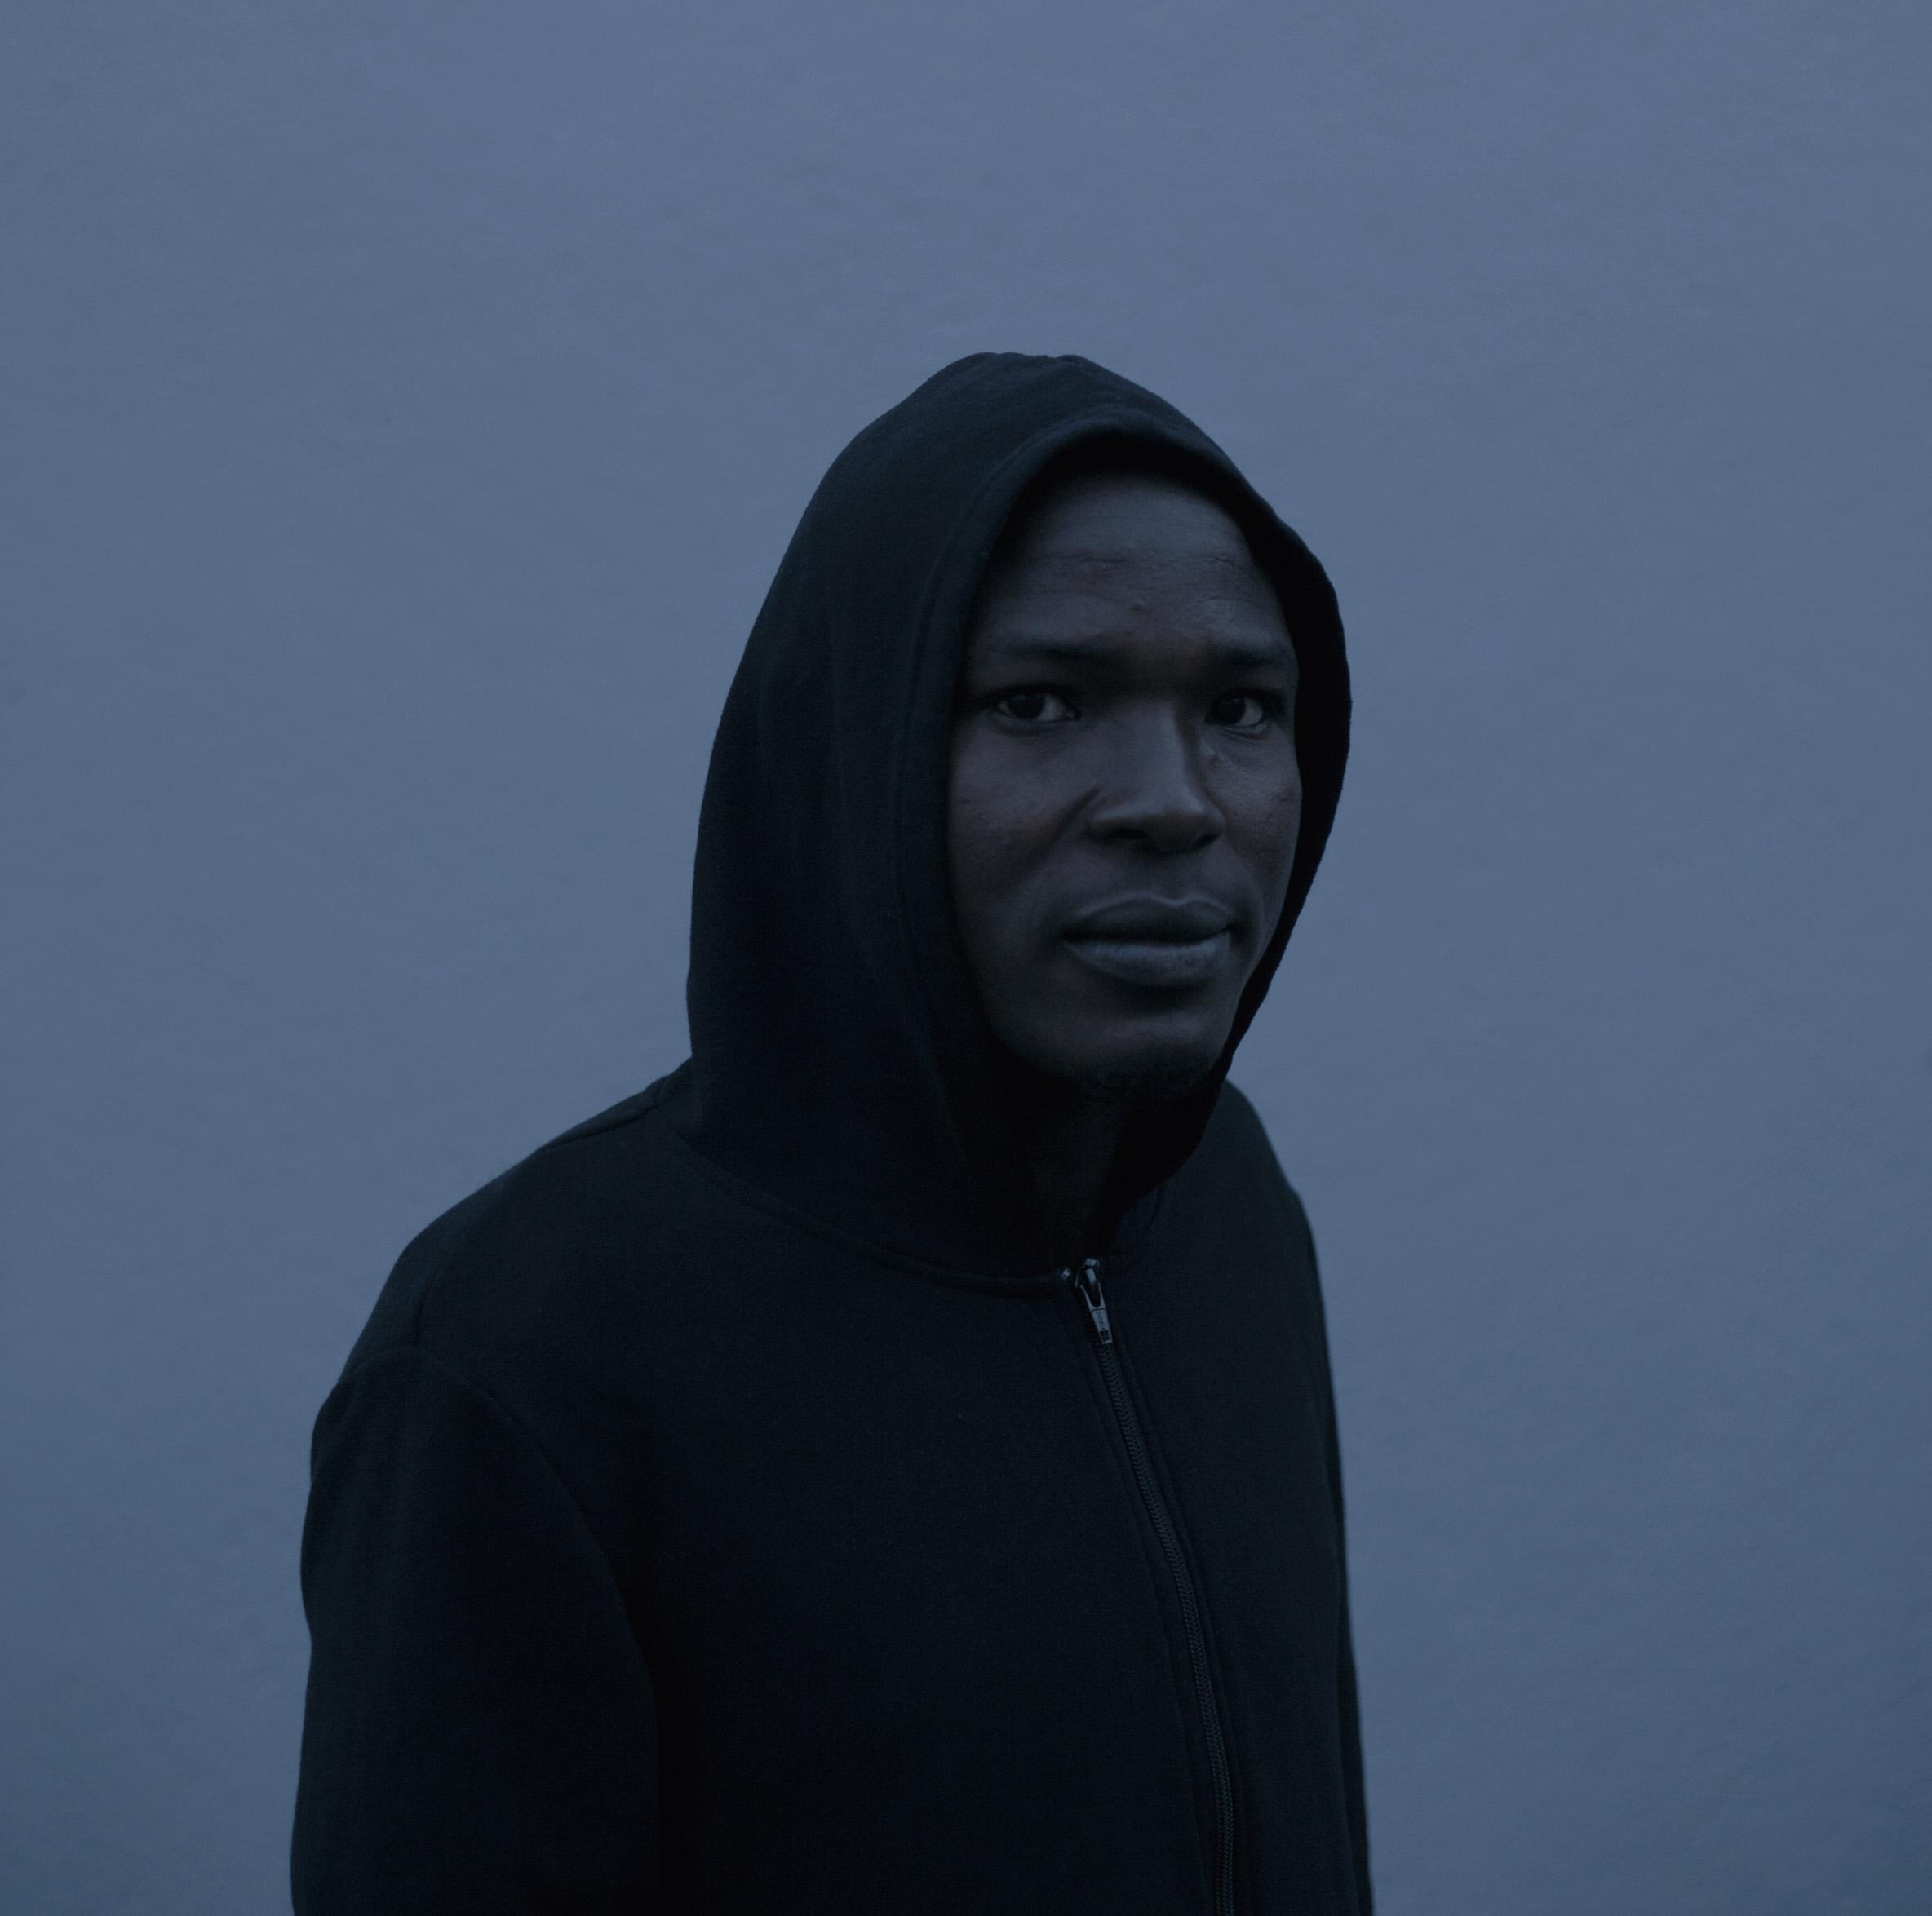 Claude Iverné, Ahmad Ali Abdulgari, Bergo people, Asylum seeker, Trégastel, Dec. 2016